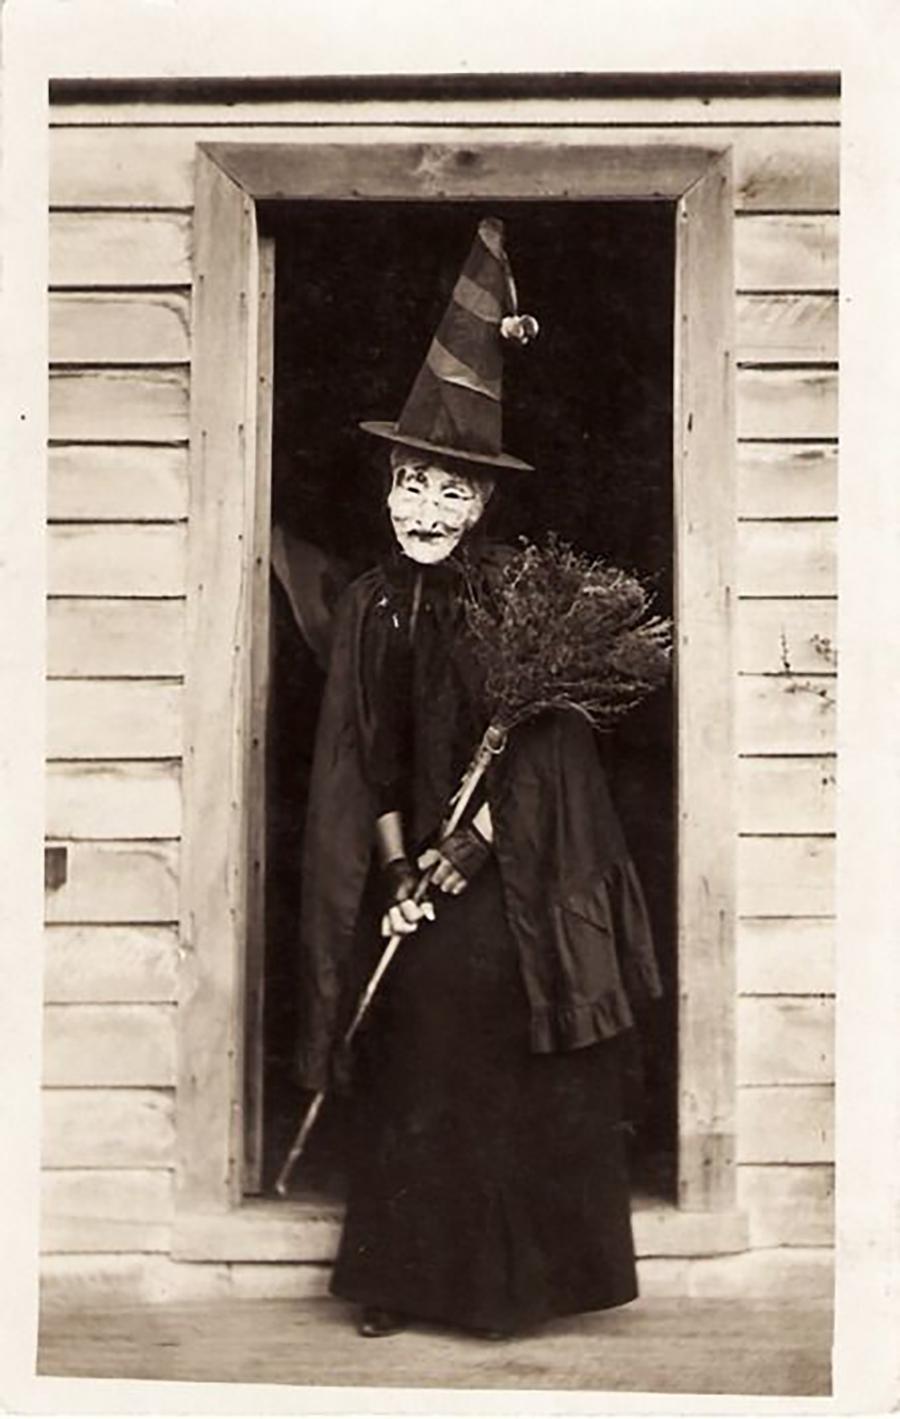 Hallowen - Fantasia de Bruxa